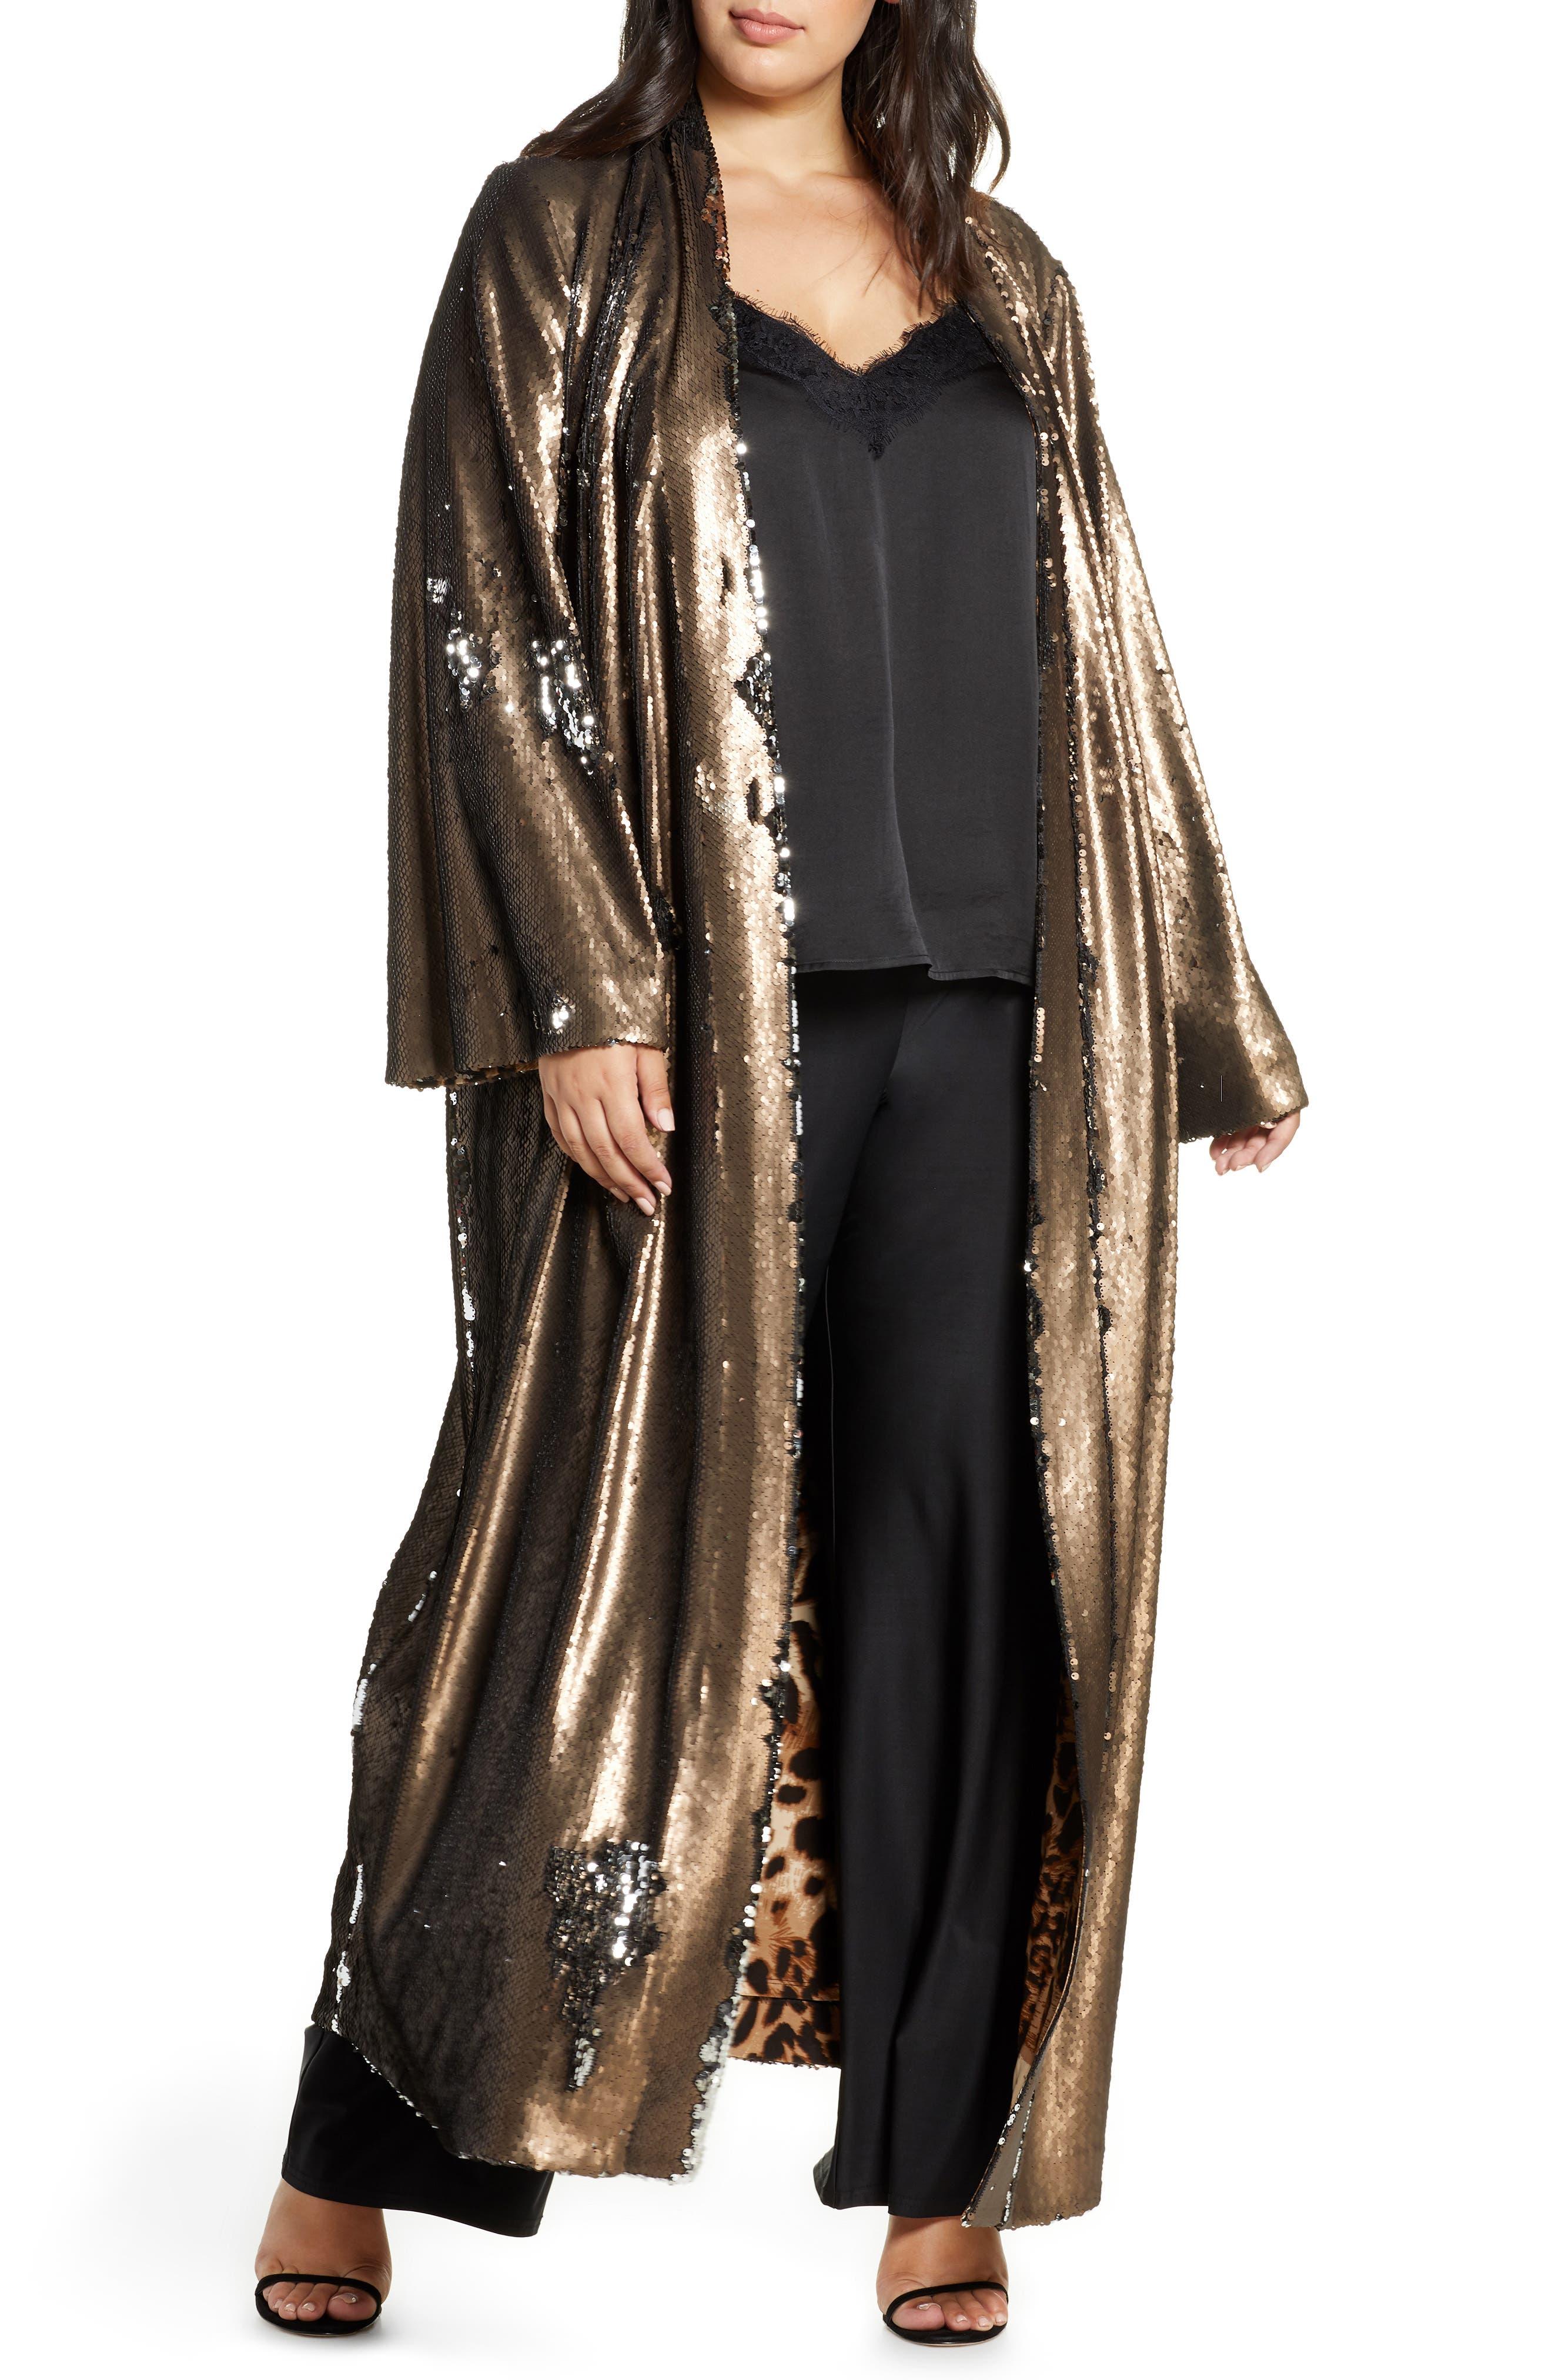 1920s Coats, Flapper Coats, 20s Jackets Plus Size Womens Coldesina Sequin Duster $498.00 AT vintagedancer.com